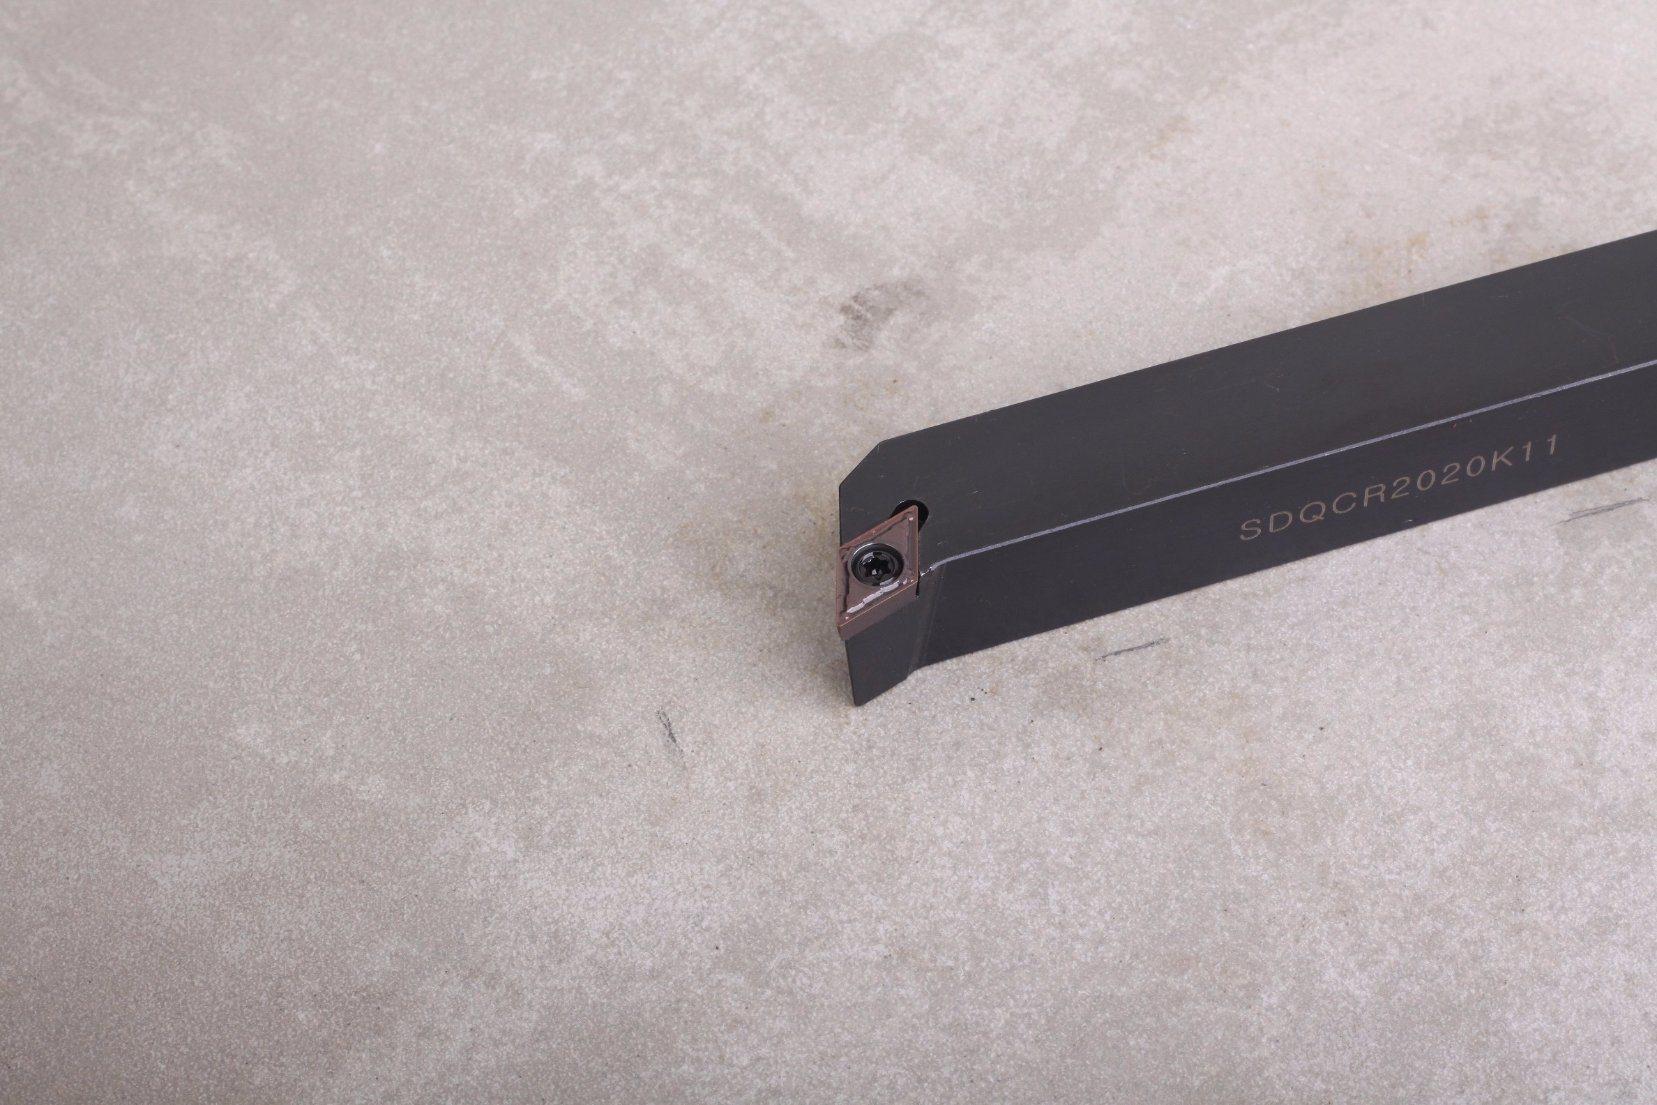 Cutoutil Stgcr/L 0808d09 for Steel Hardmetal Matching Standard Turning Tools